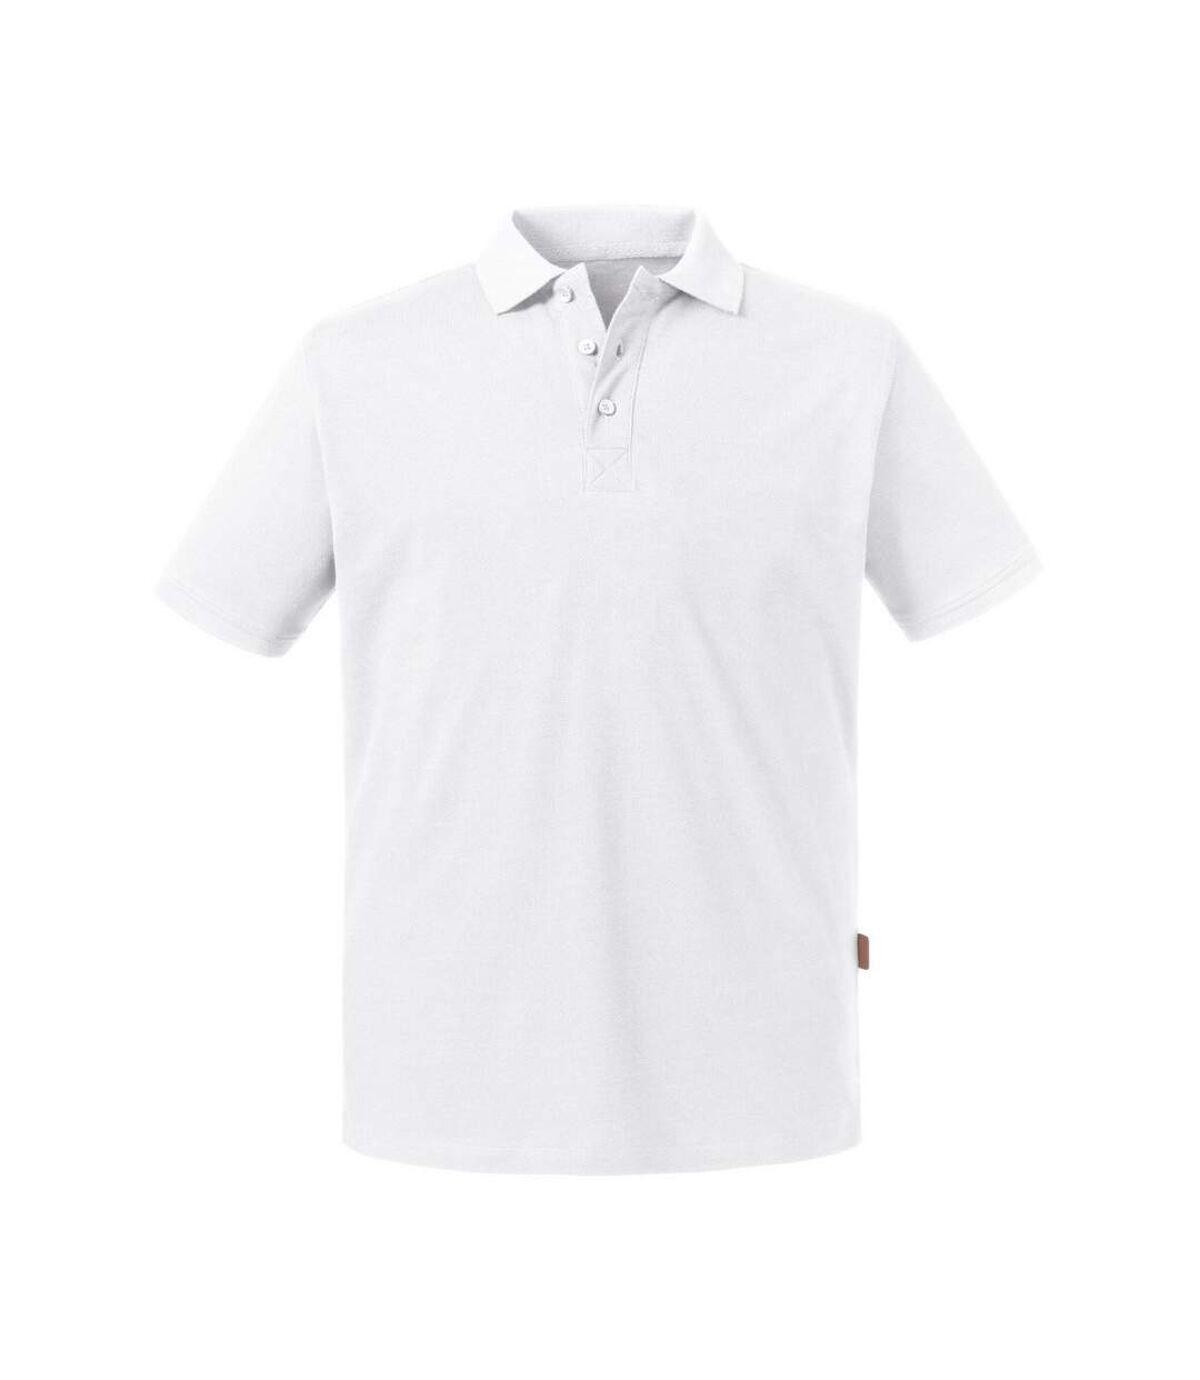 Russell Mens Pure Organic Polo (White) - UTBC4664